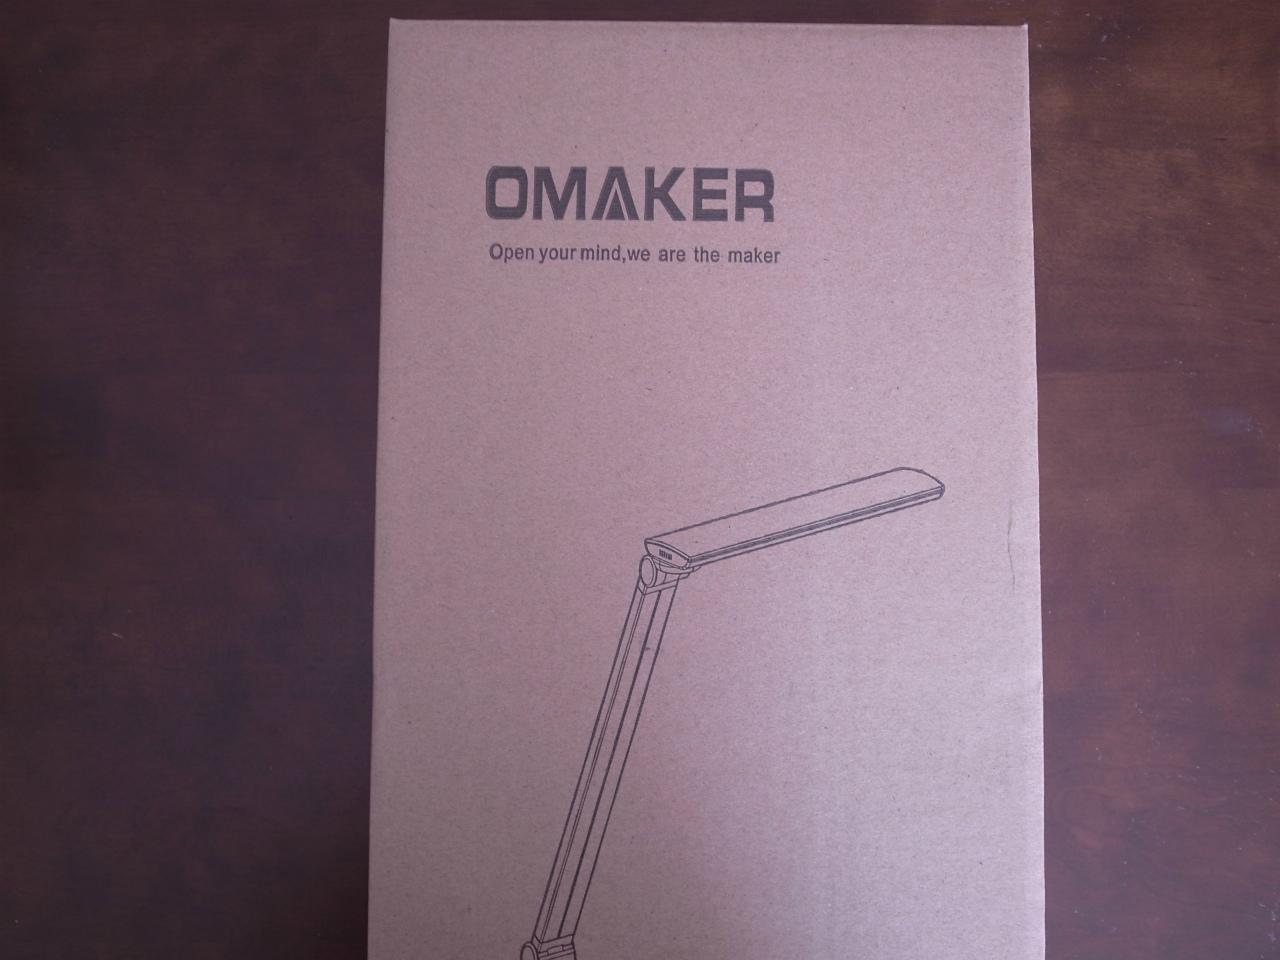 1201-201603_Omaker LED Desklight 01